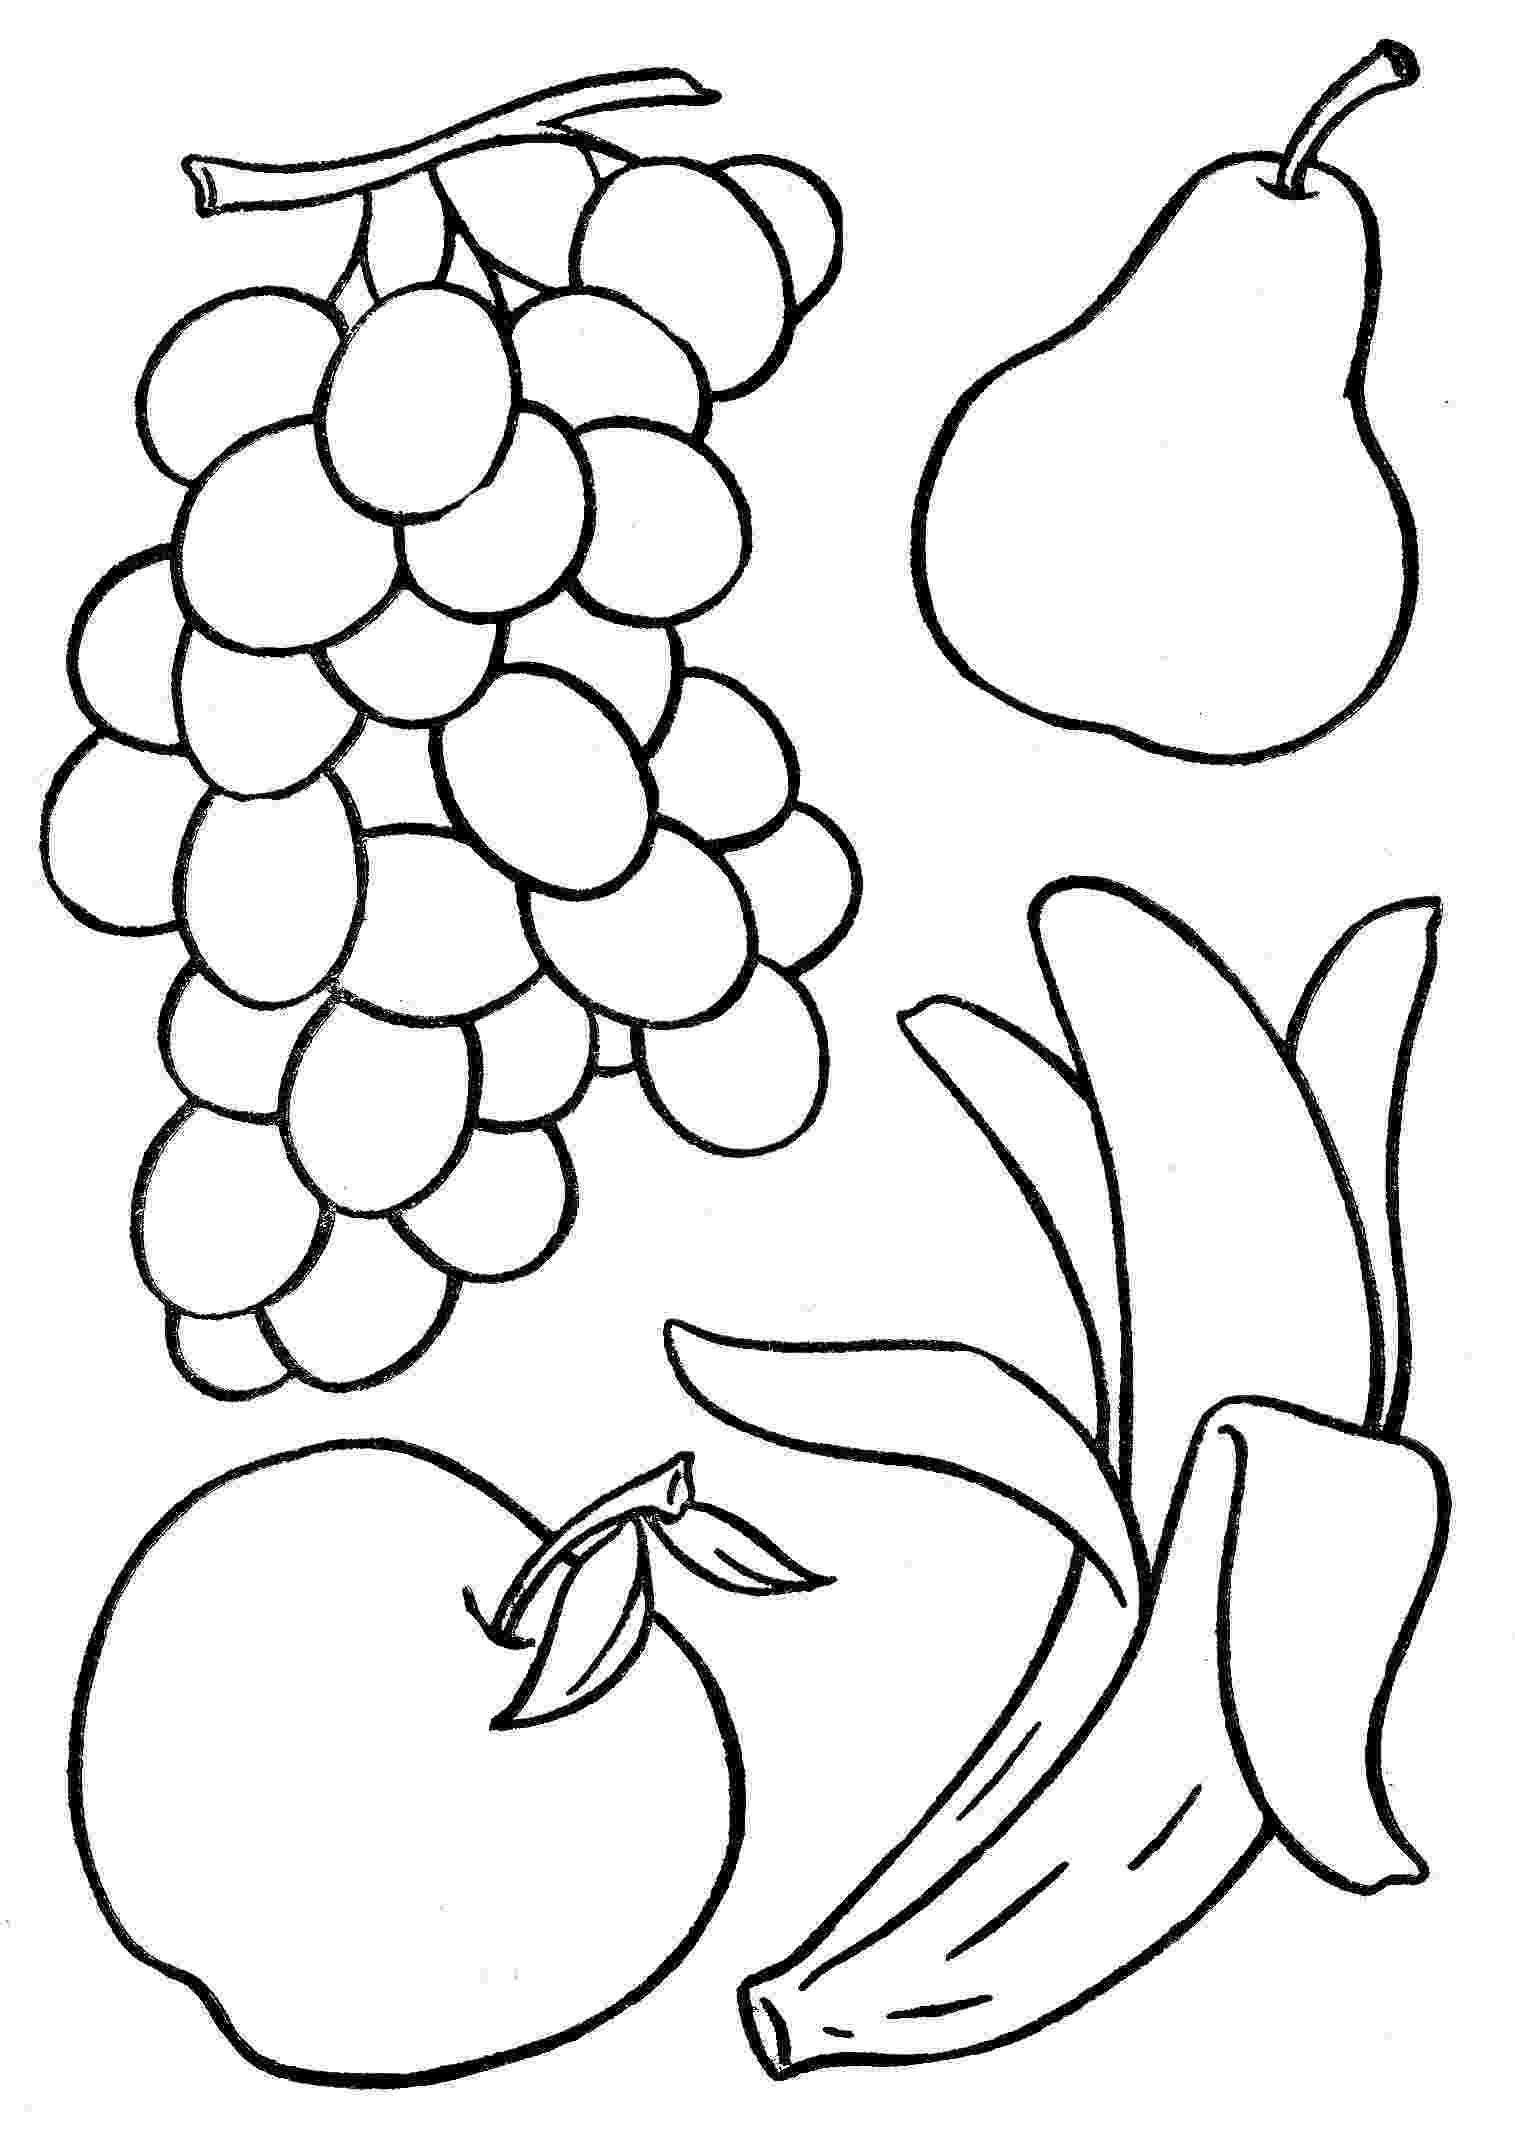 printable vegetables vegetable coloring pages best coloring pages for kids printable vegetables